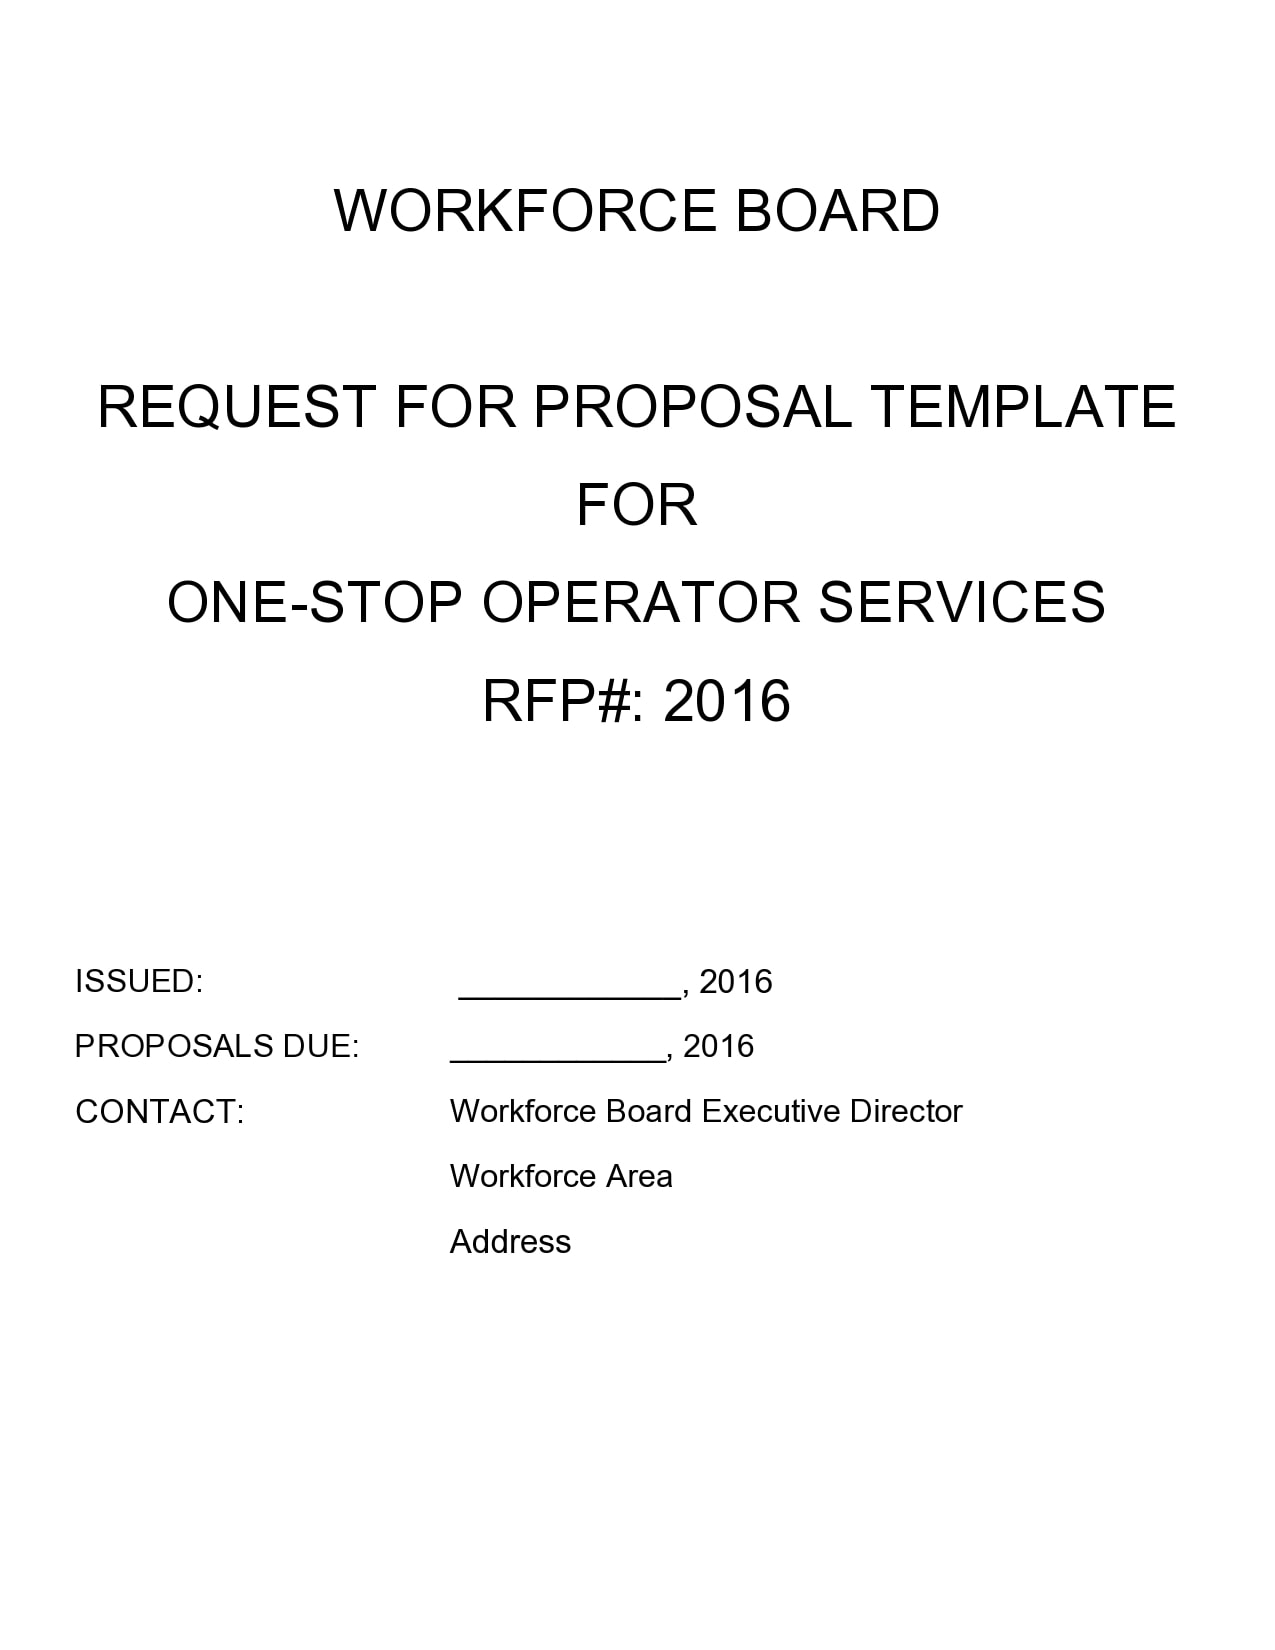 rfp template 21